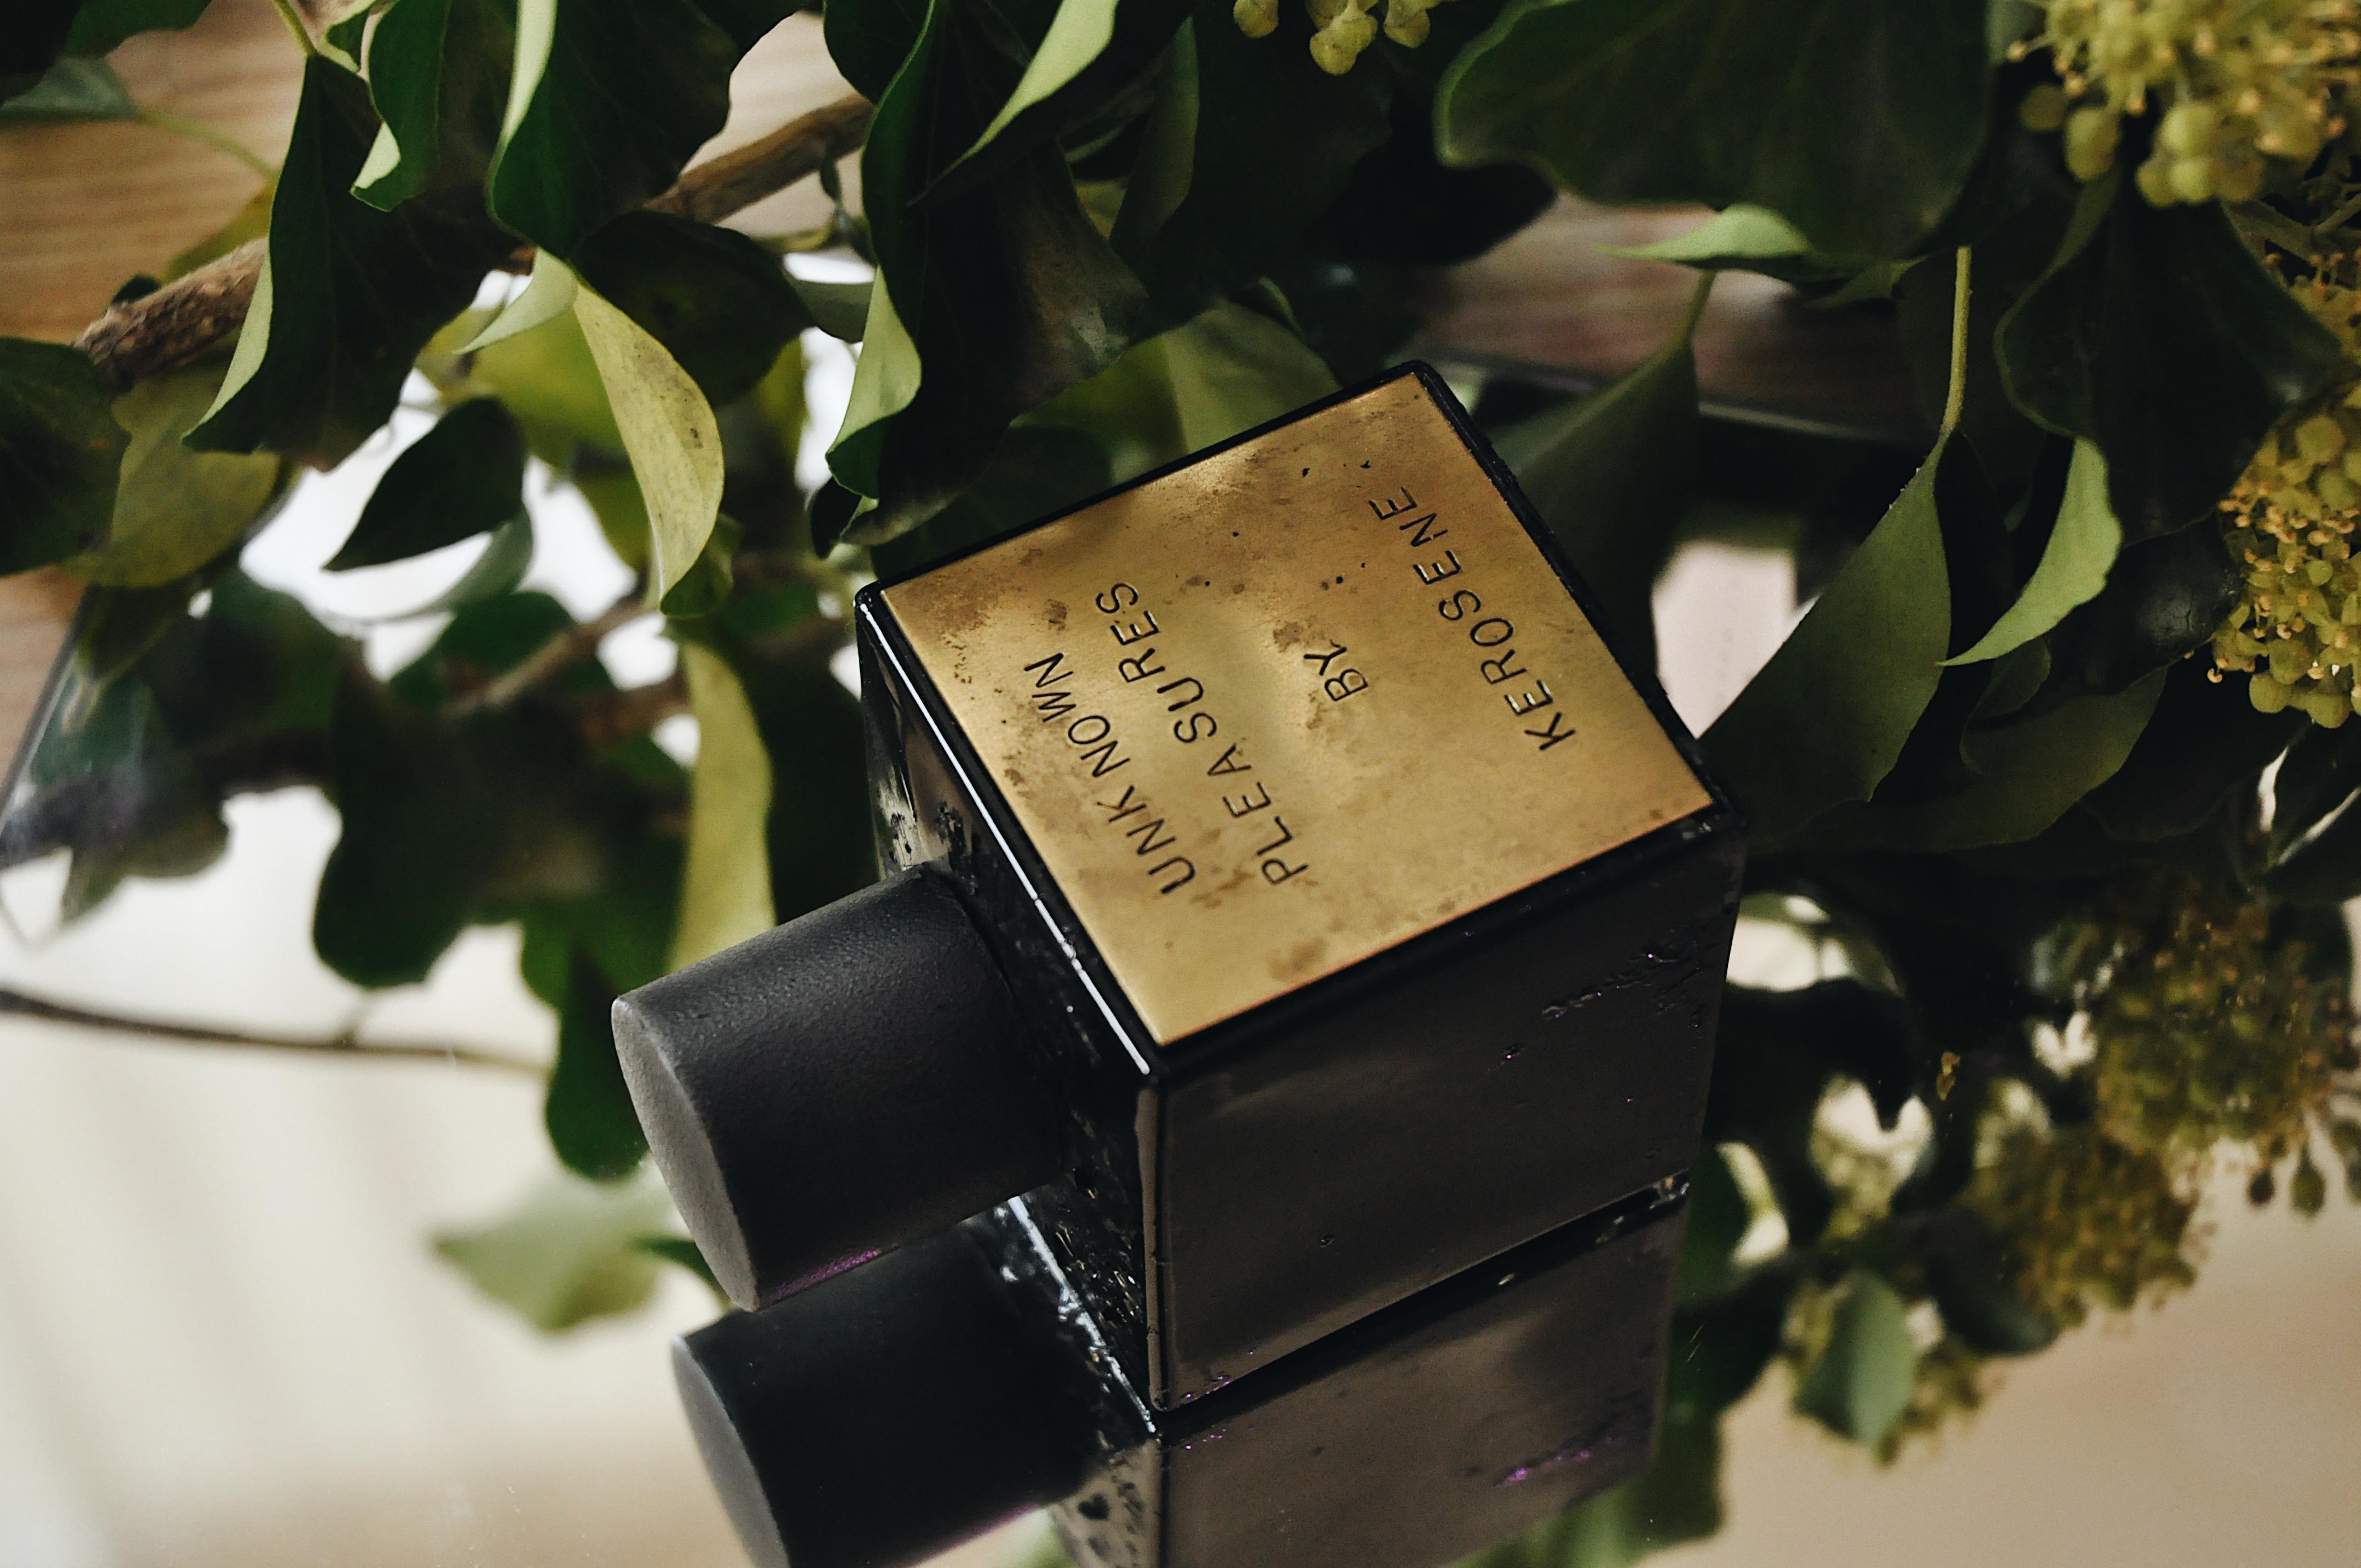 Kerosene Fragrances Unknown Pleasures